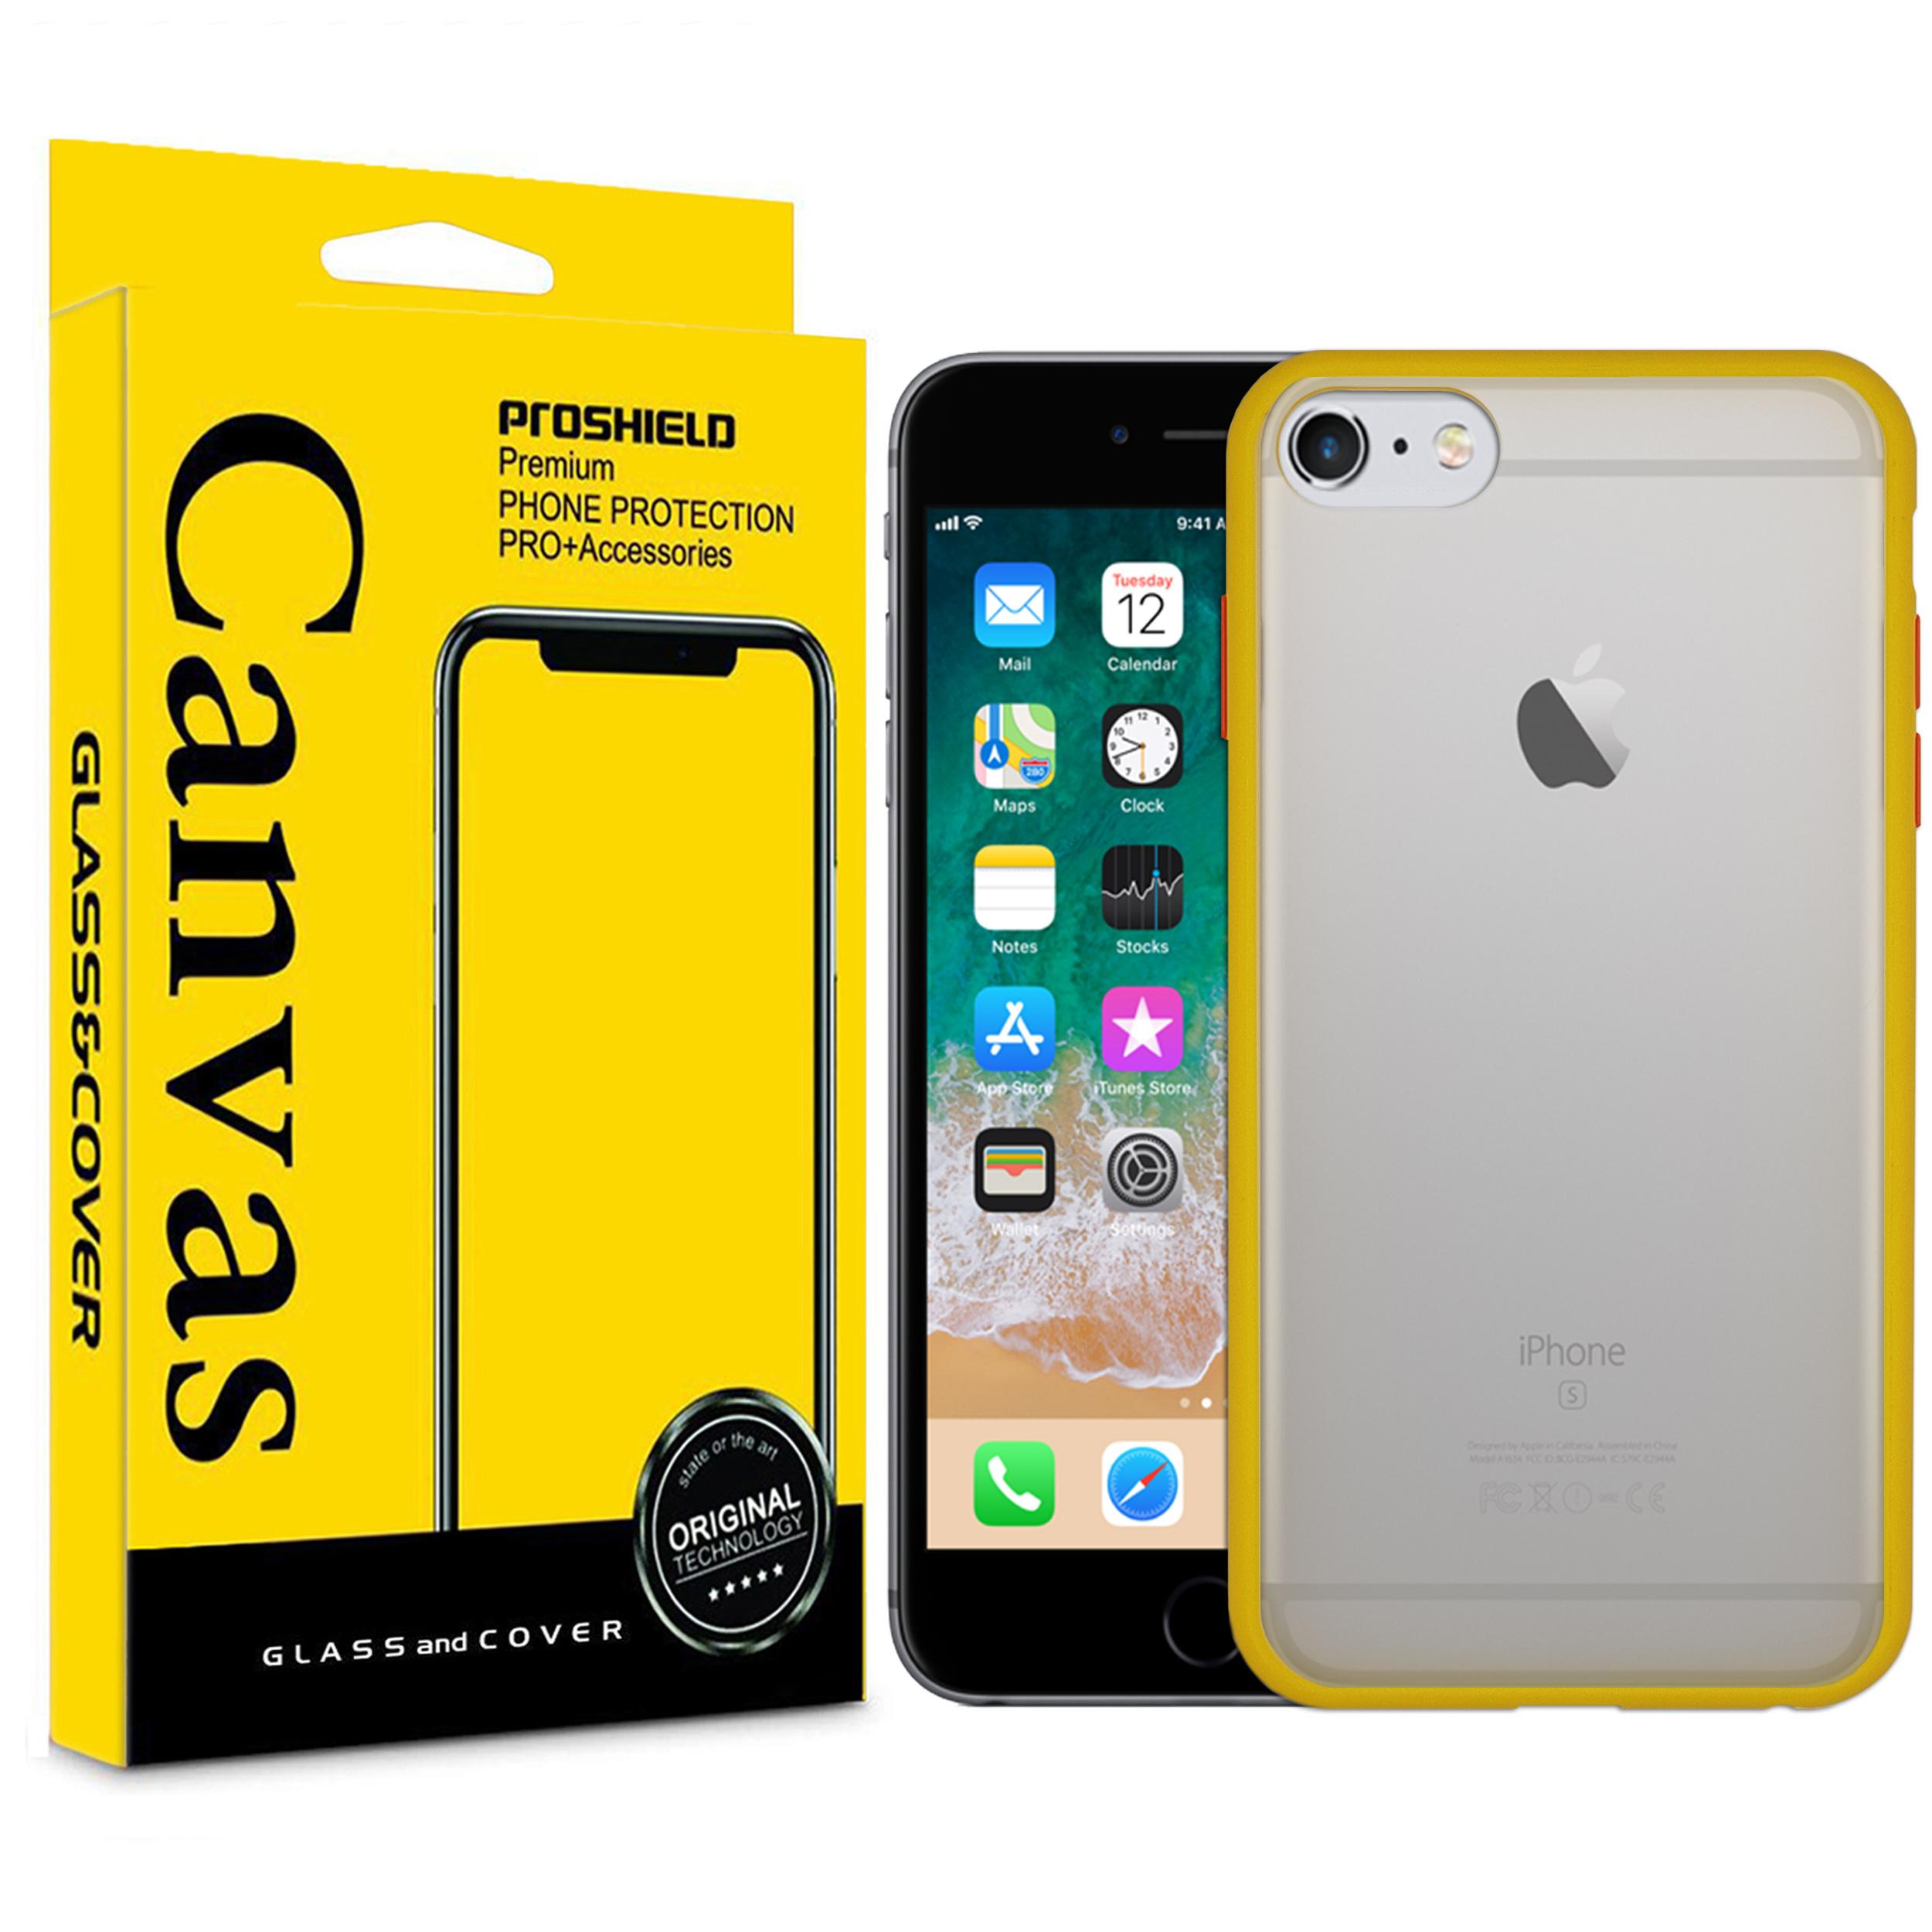 کاور کانواس مدل BMH-01 مناسب برای گوشی موبایل اپل iPhone 6 /6s